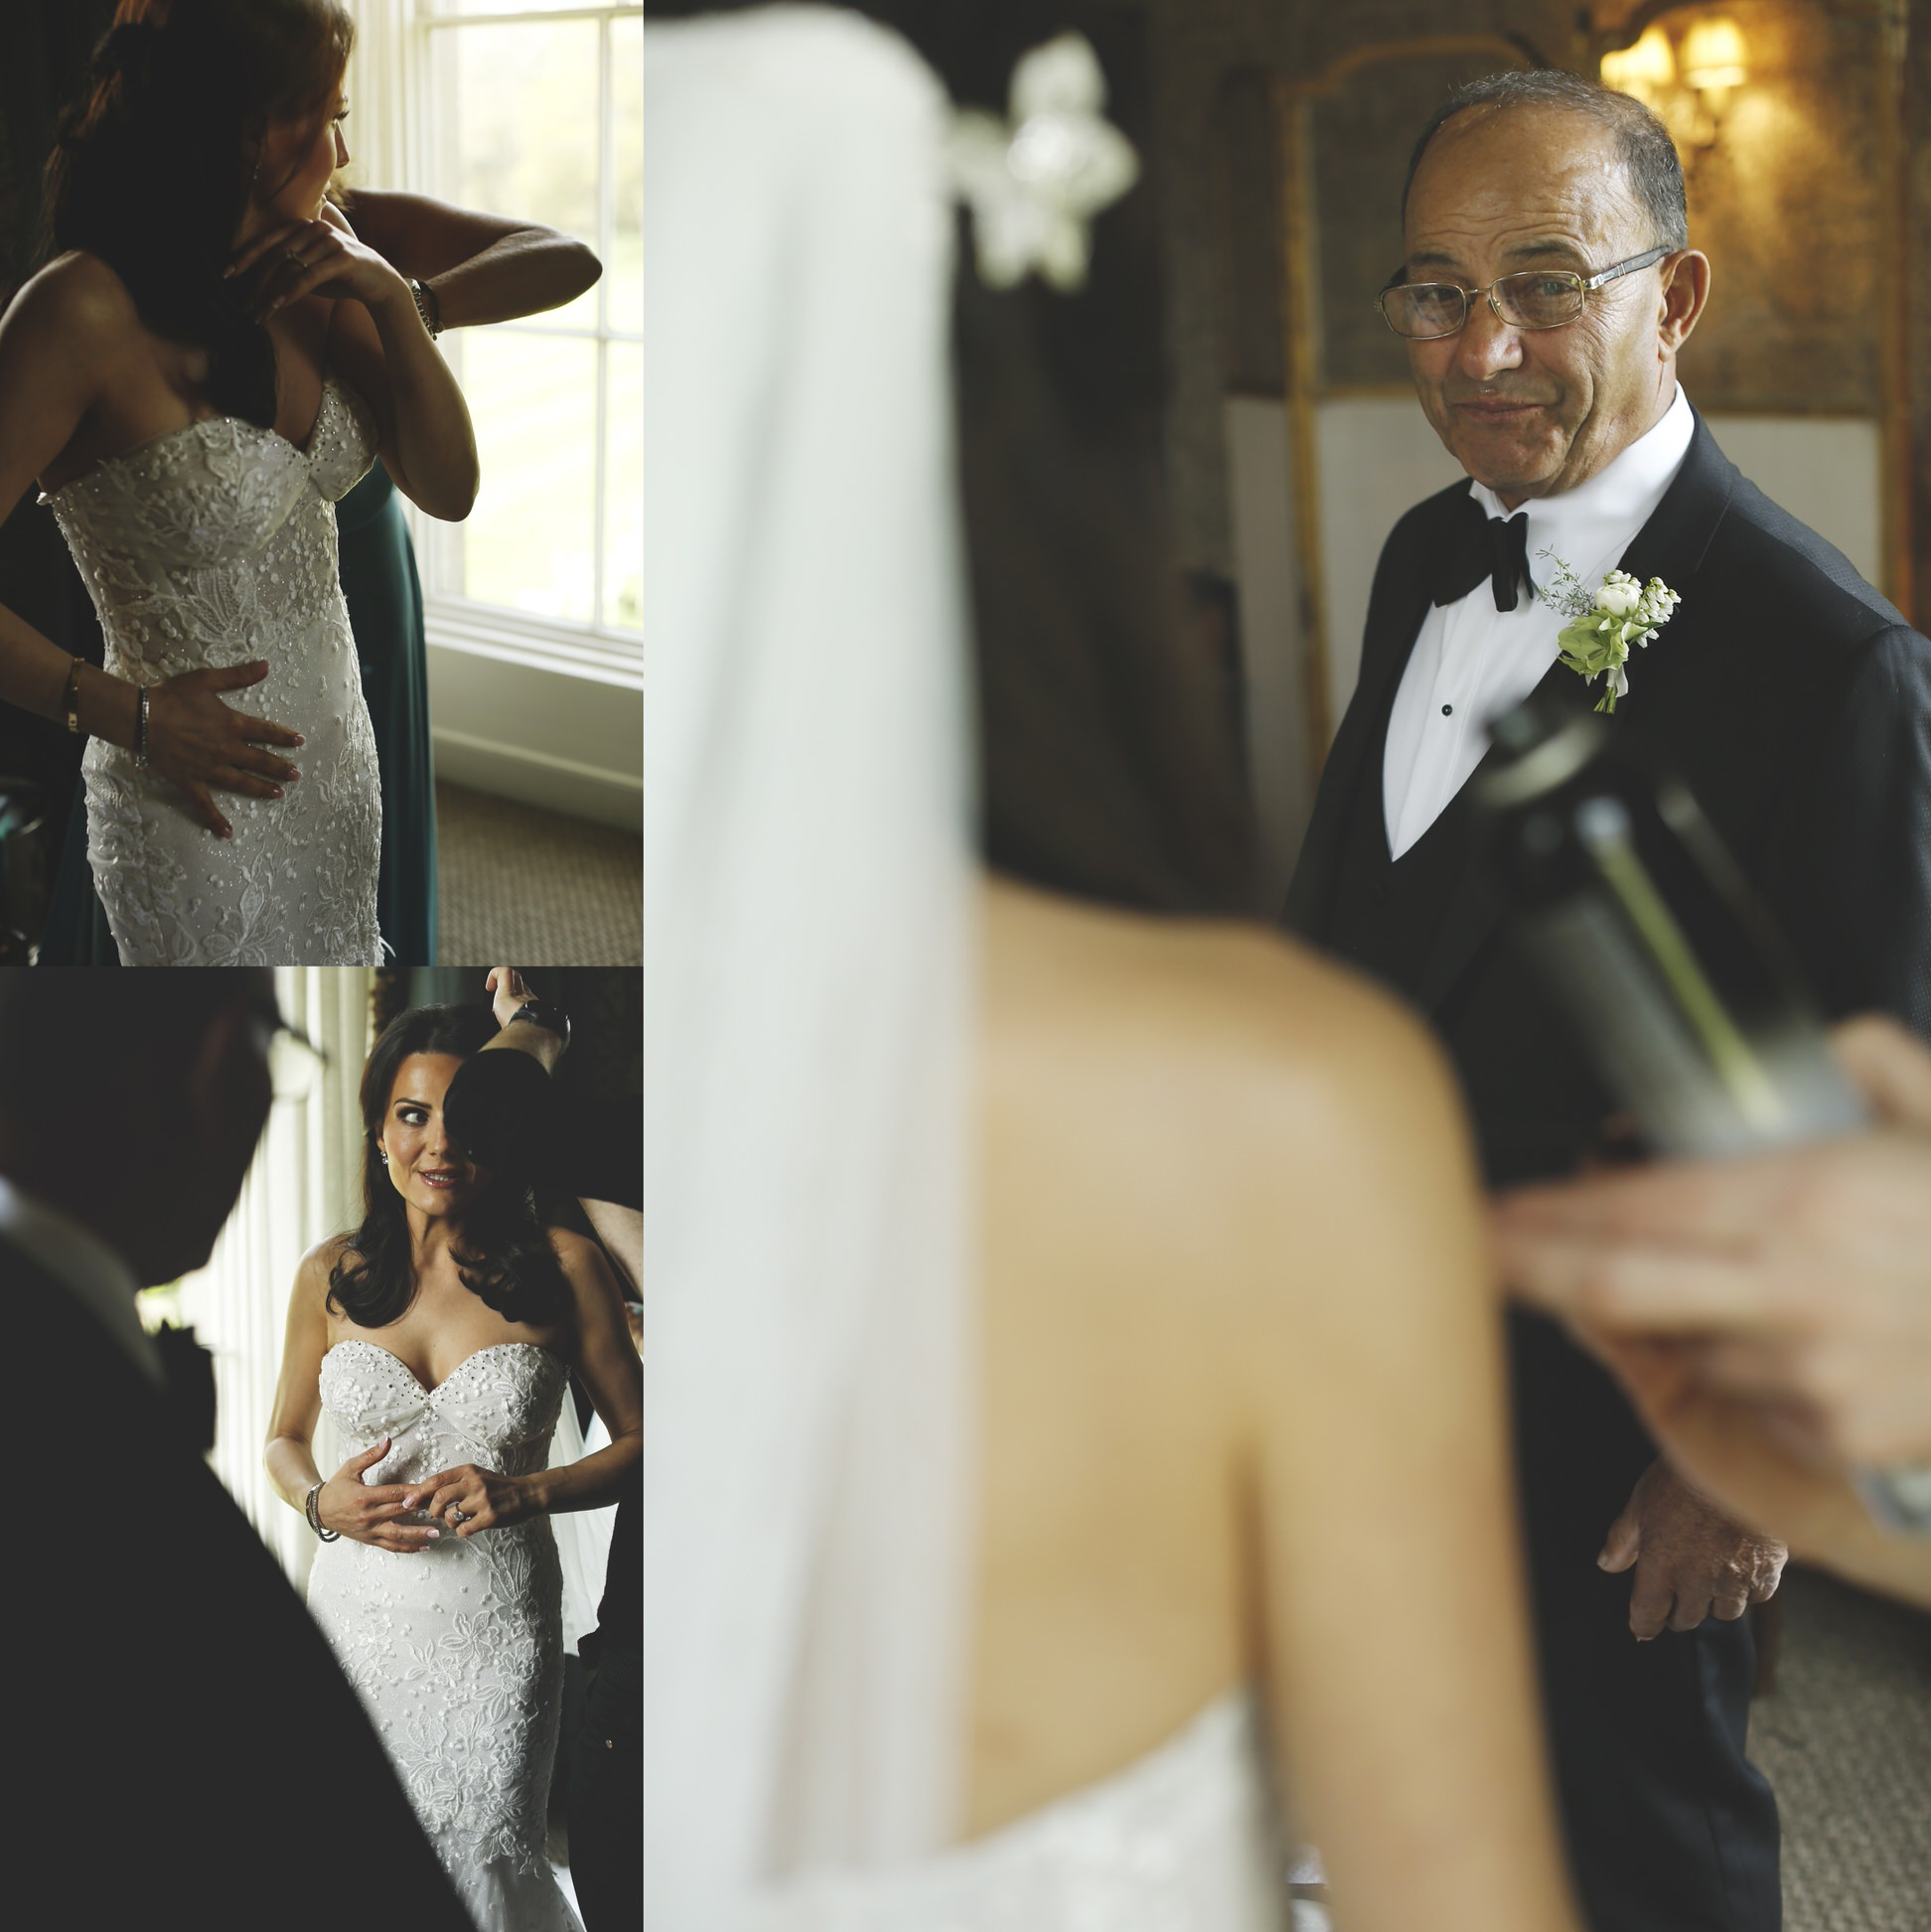 brettharkness-luxury-wedding-photographer-uk_0022.jpg